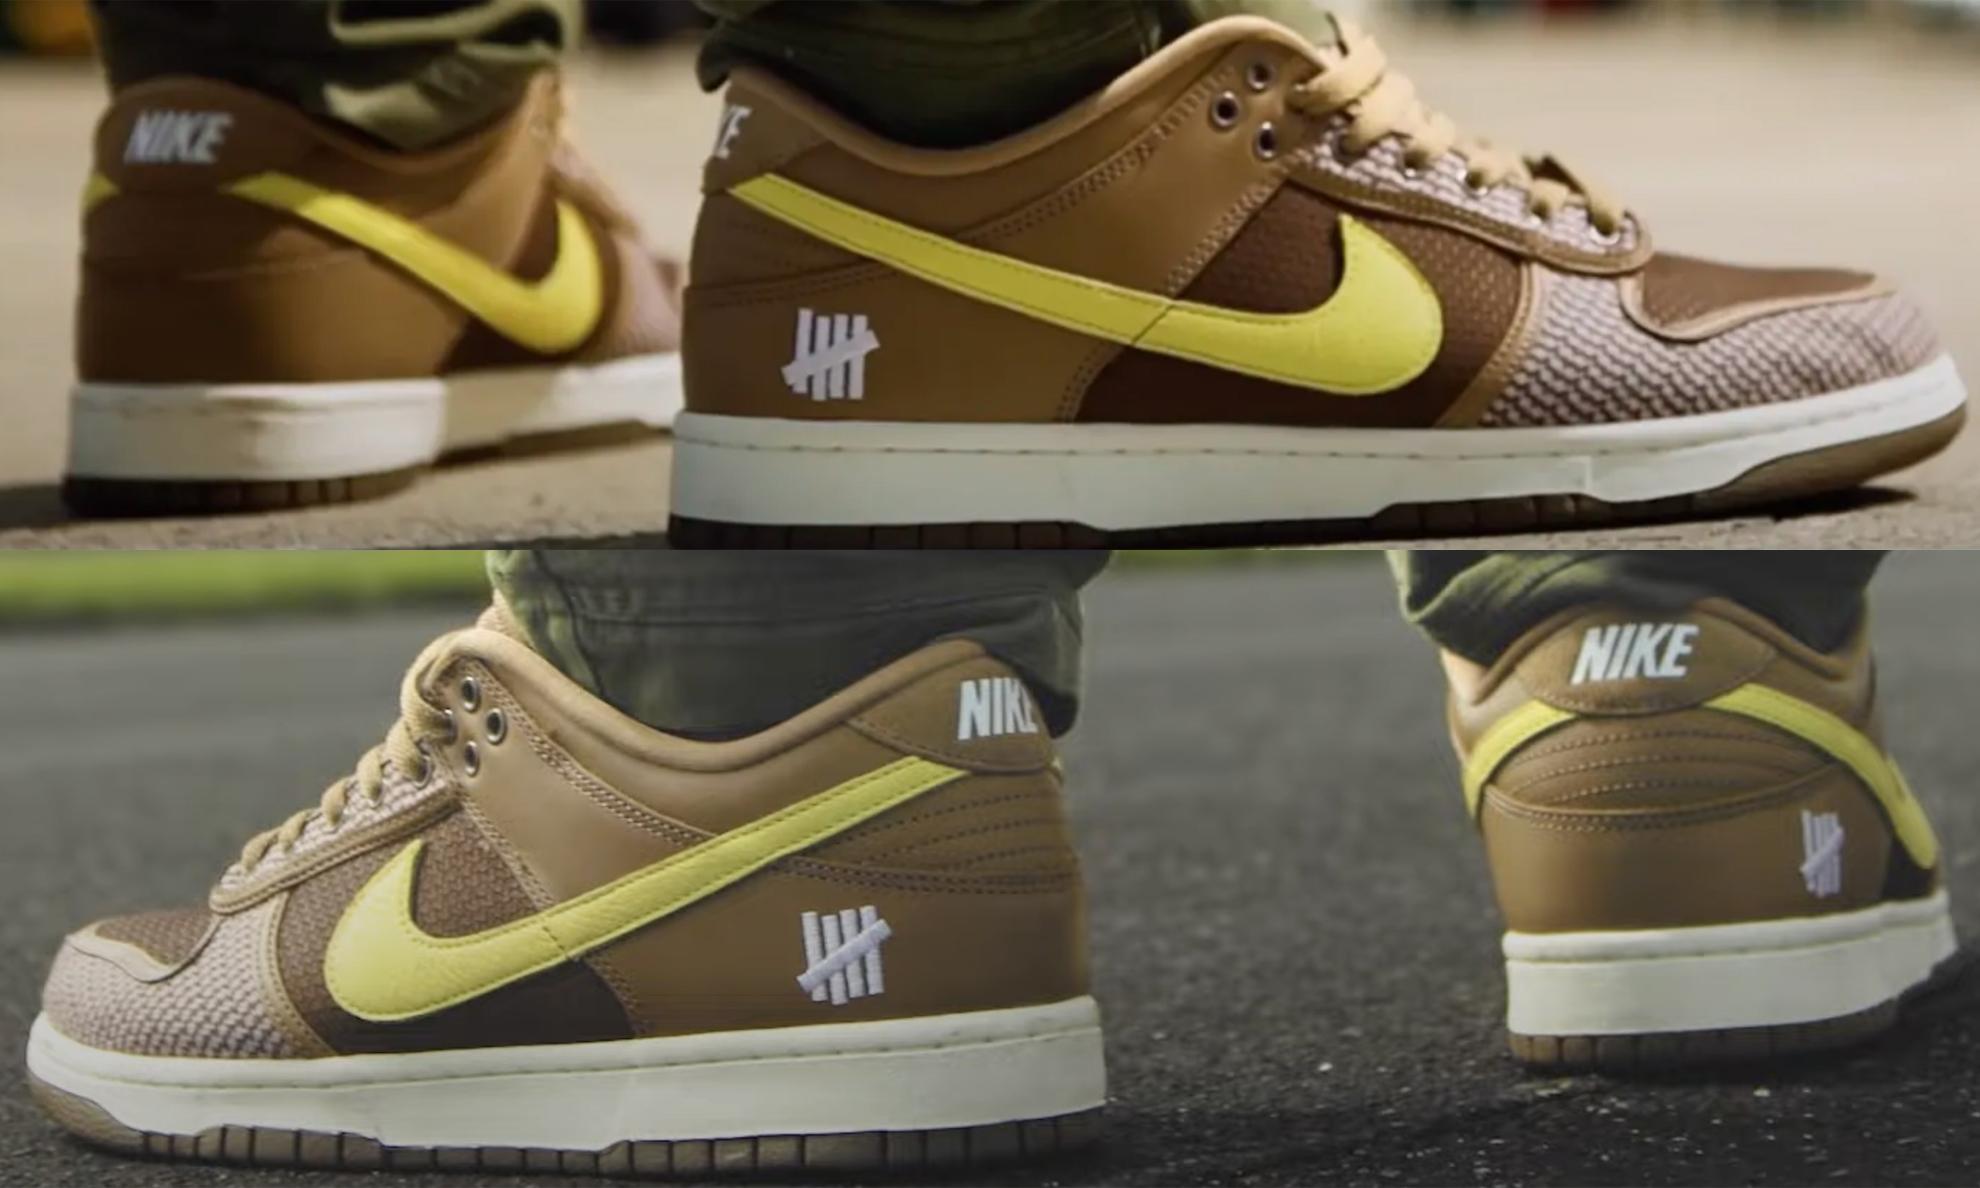 UNDEFEATED x Nike Dunk Low 全新联名鞋款首度曝光